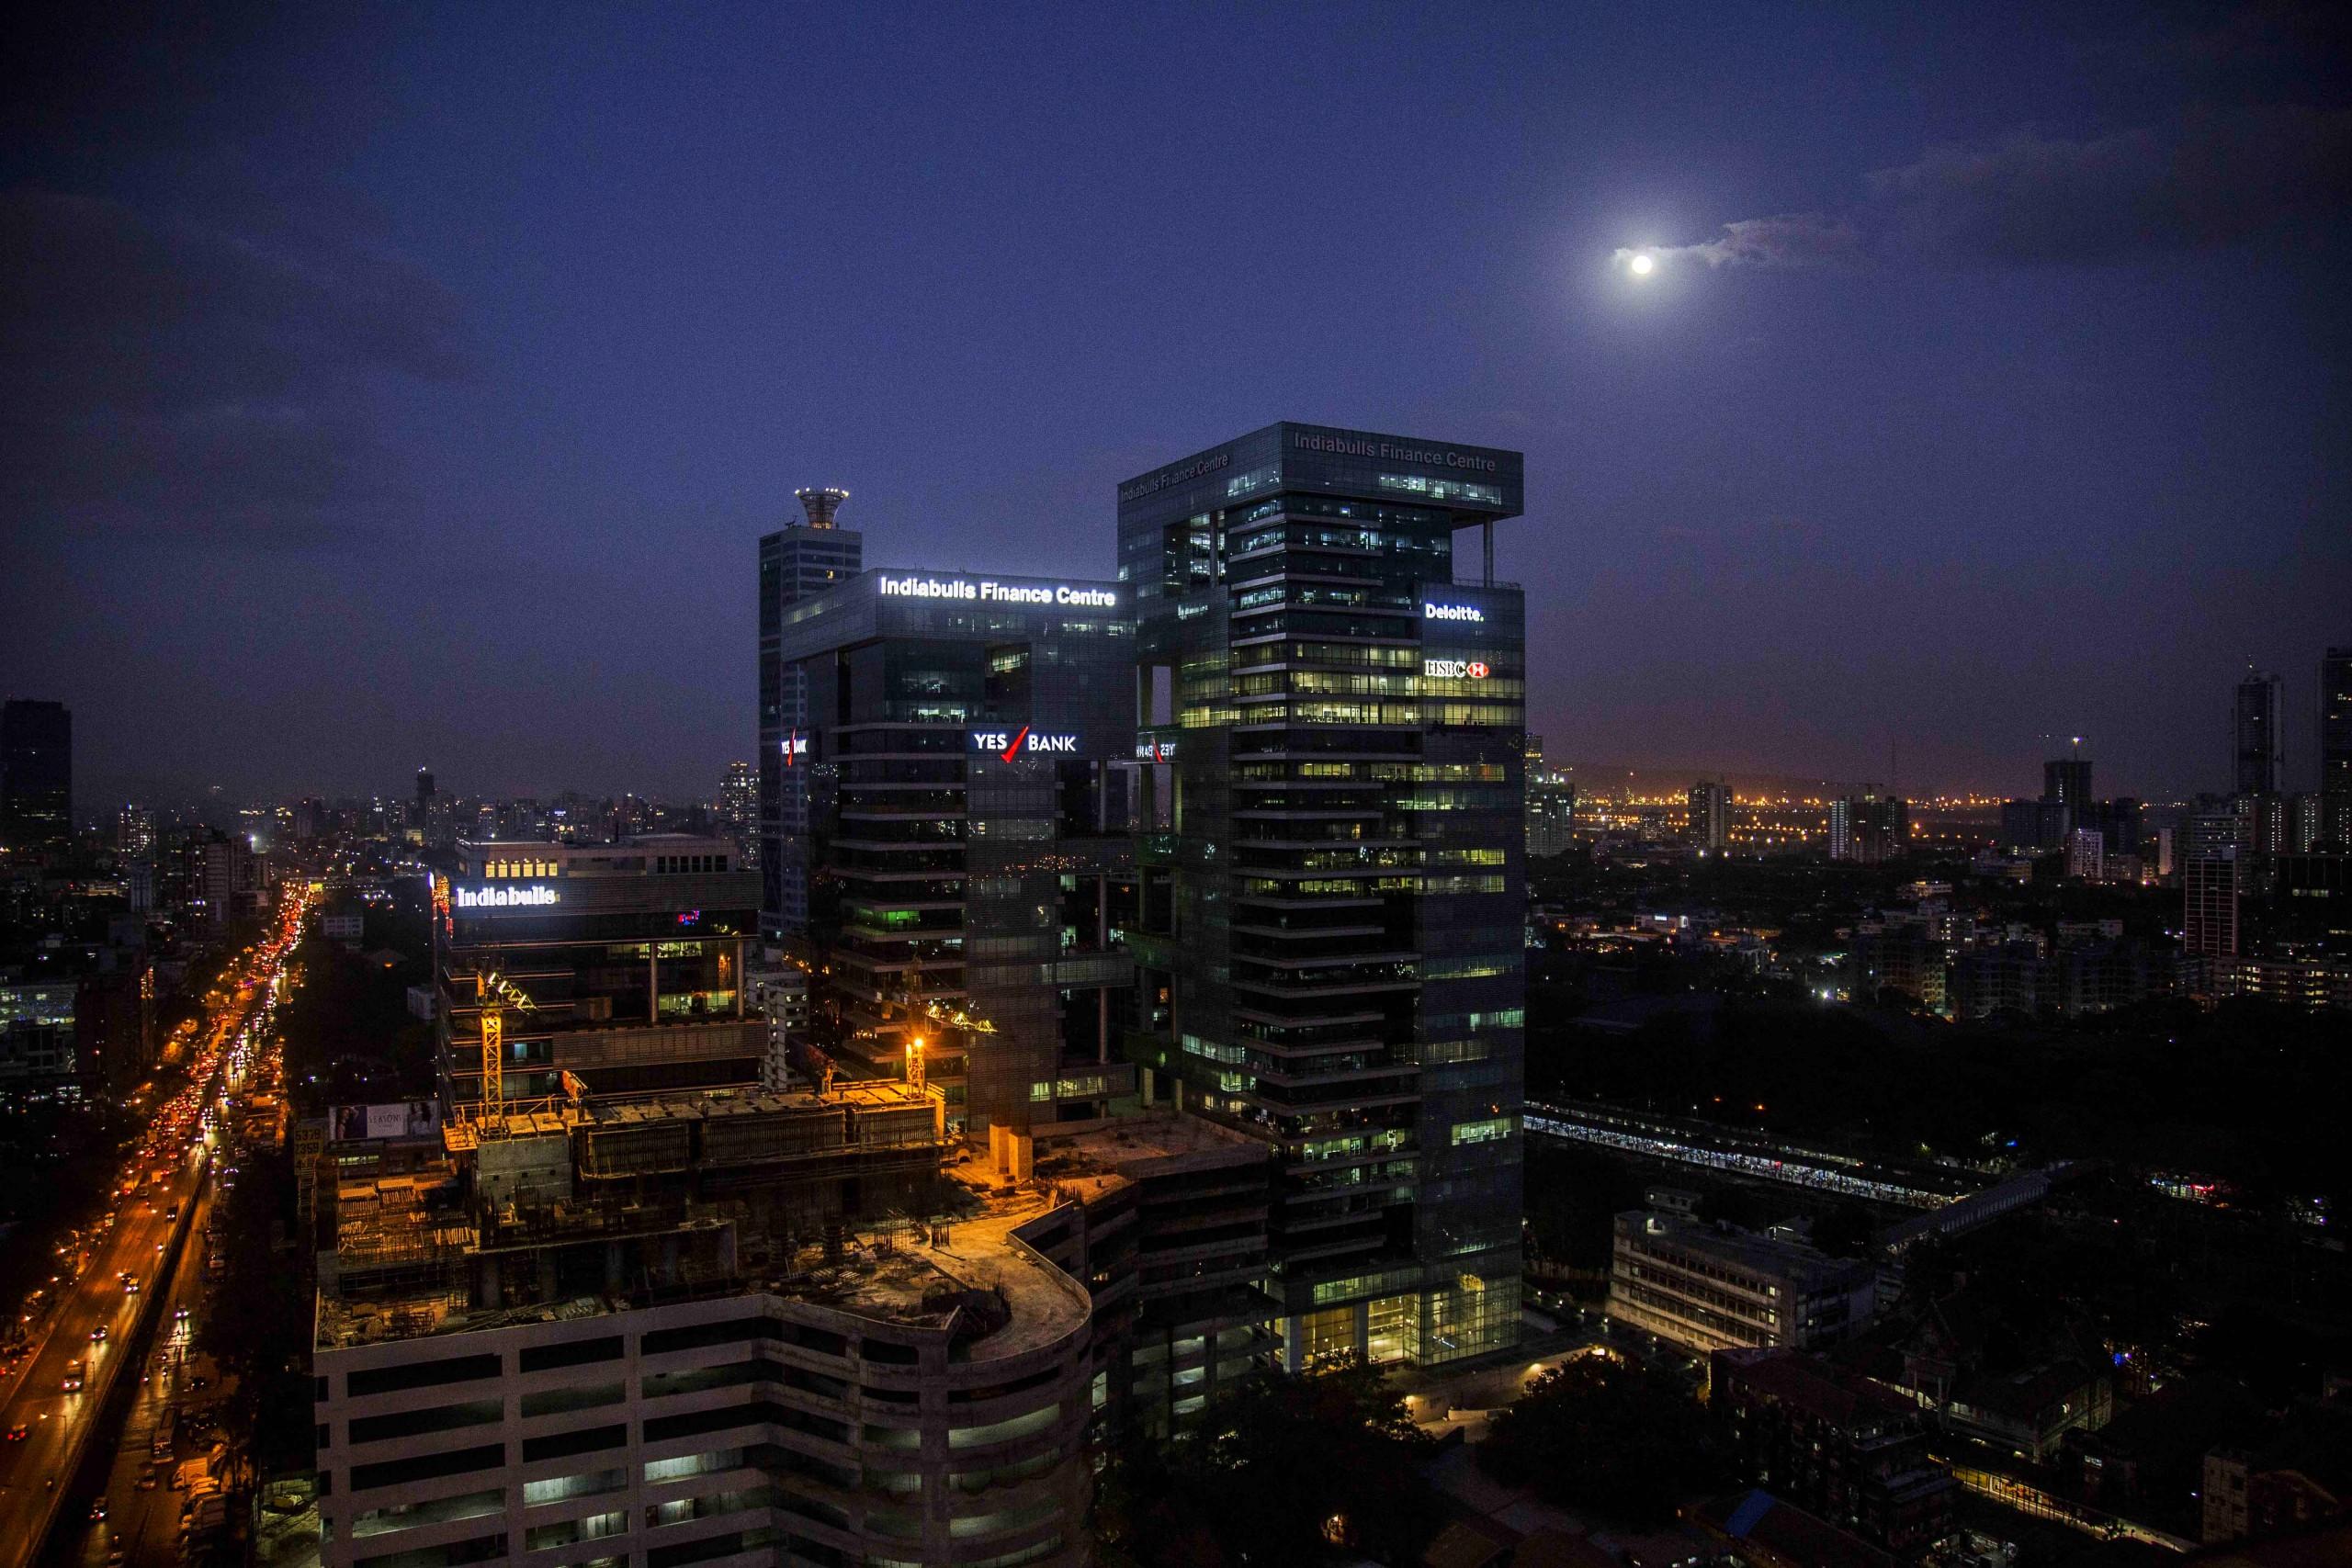 Mumbai nightview